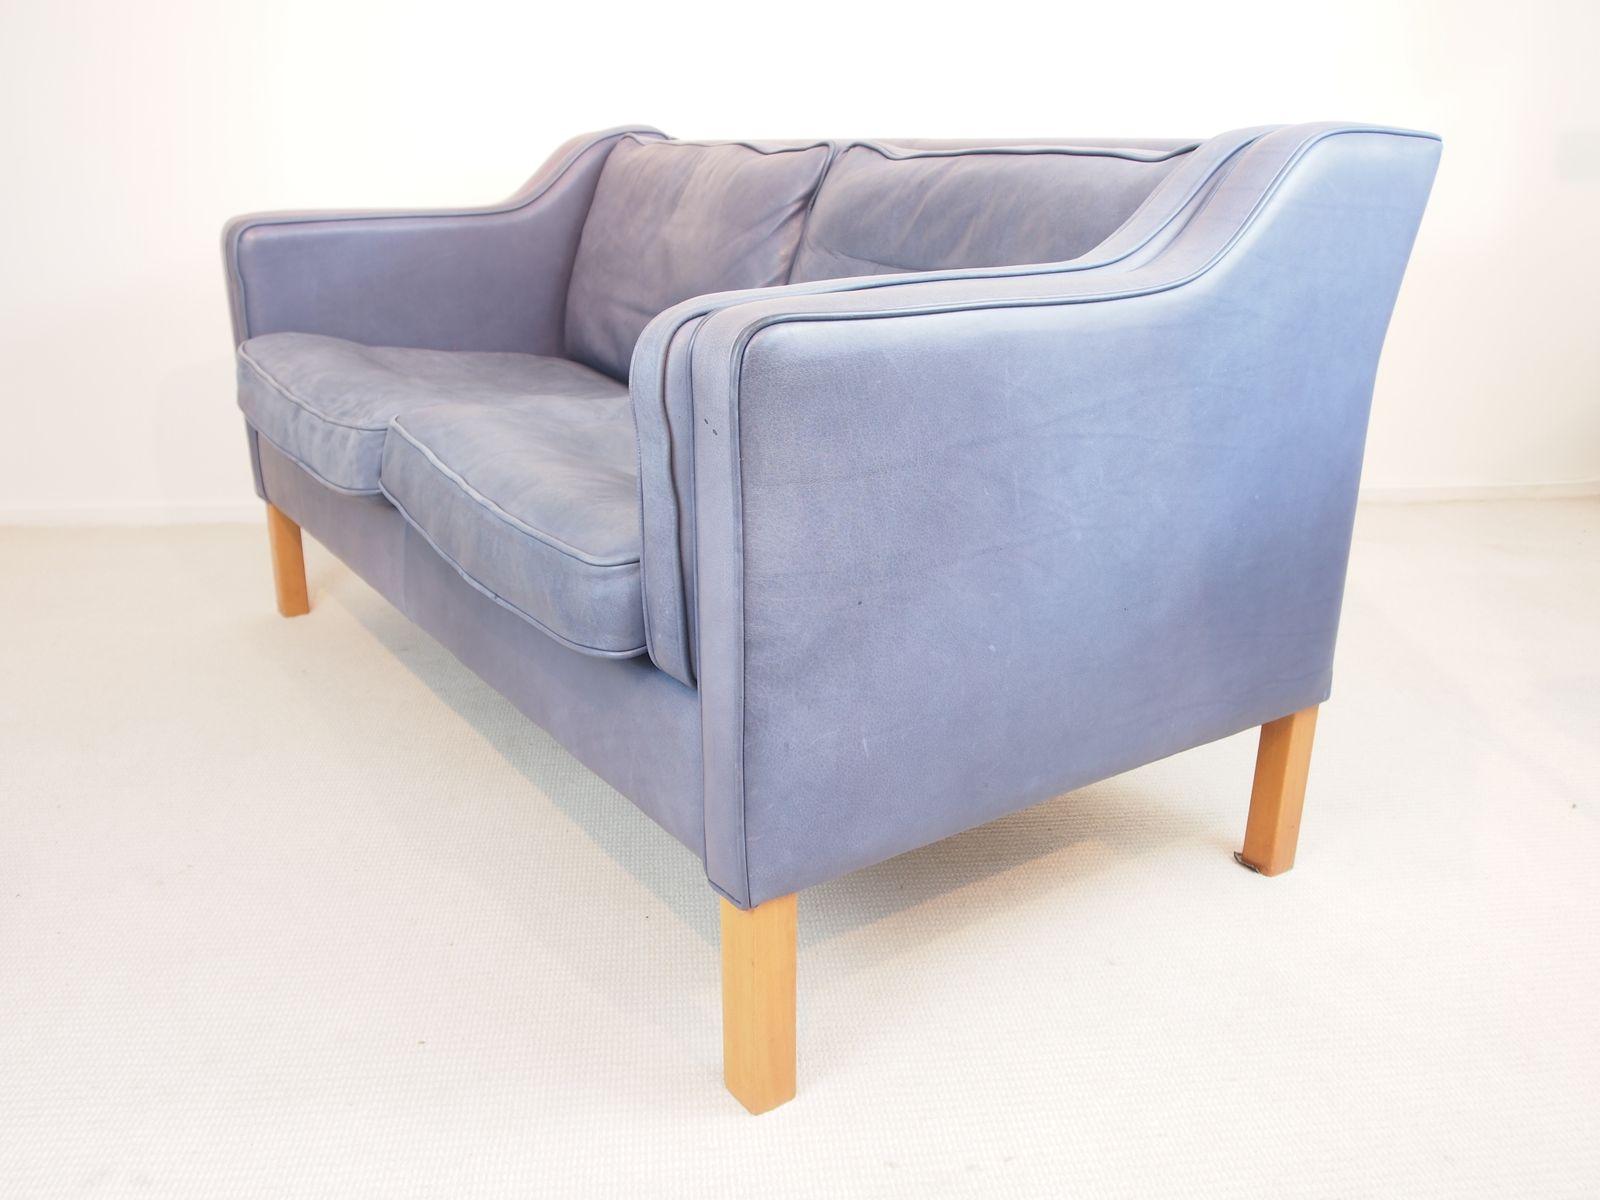 blaues vintage anilin sofa von georg thams bei pamono kaufen. Black Bedroom Furniture Sets. Home Design Ideas